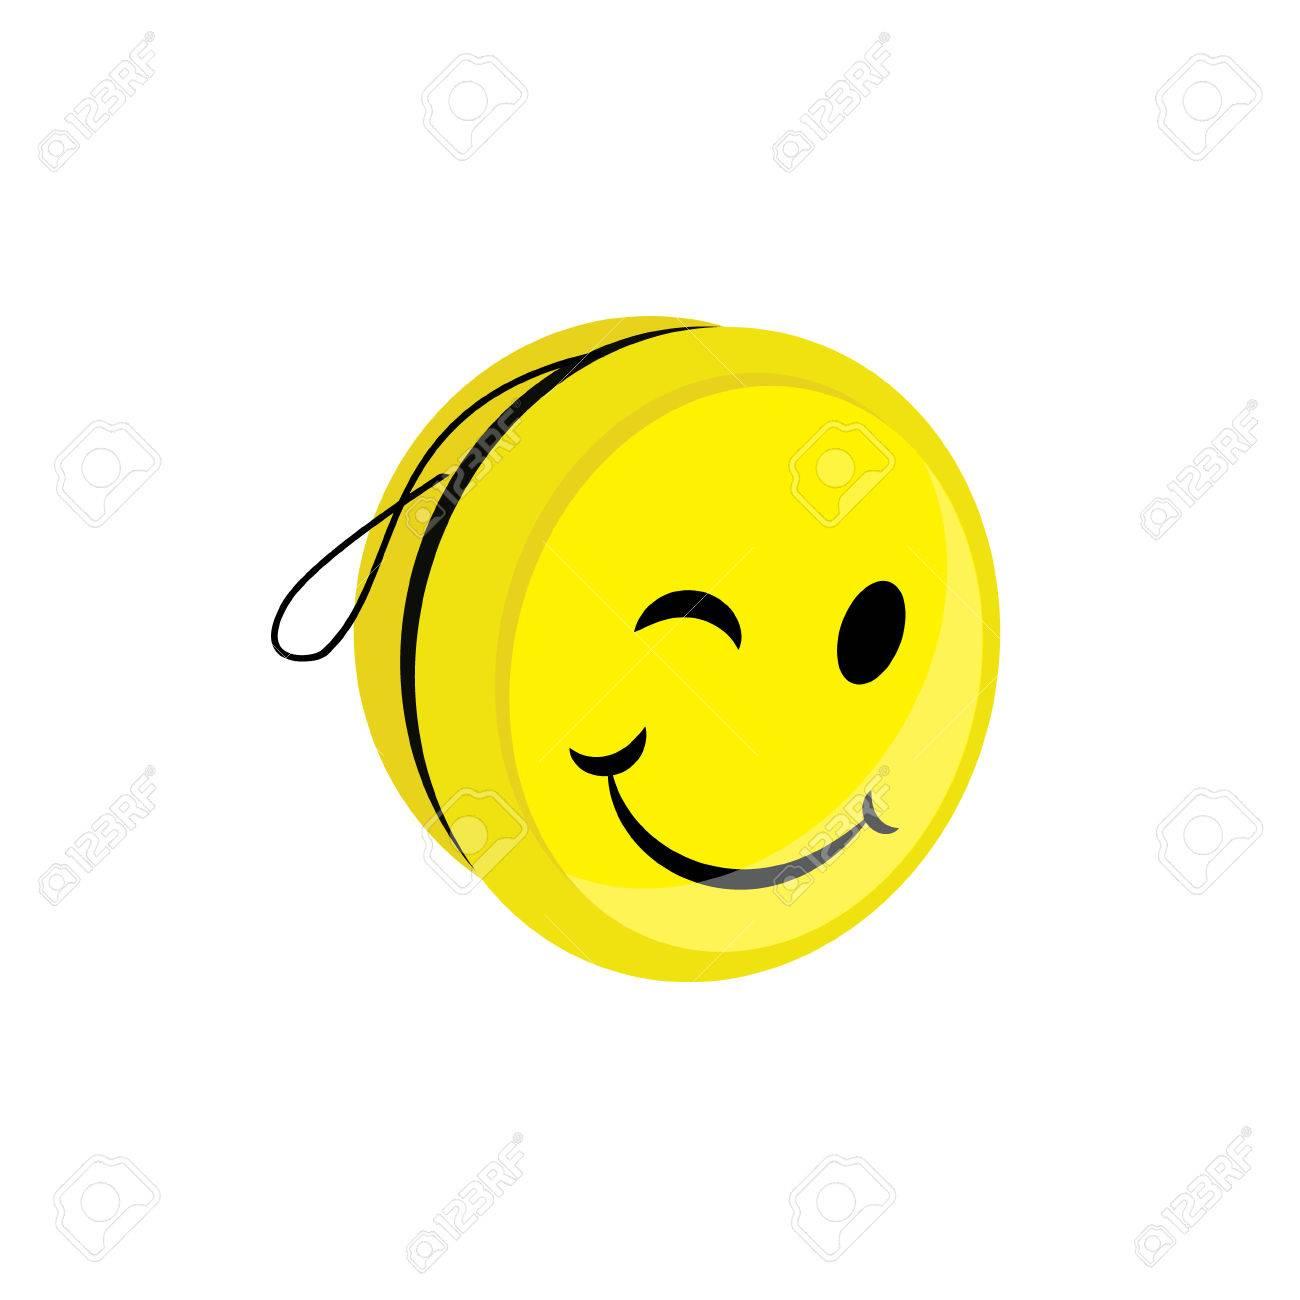 Raster illustration yellow yoyo toy with smile yo yo symbol raster illustration yellow yoyo toy with smile yo yo symbol icon flat stock illustration buycottarizona Images